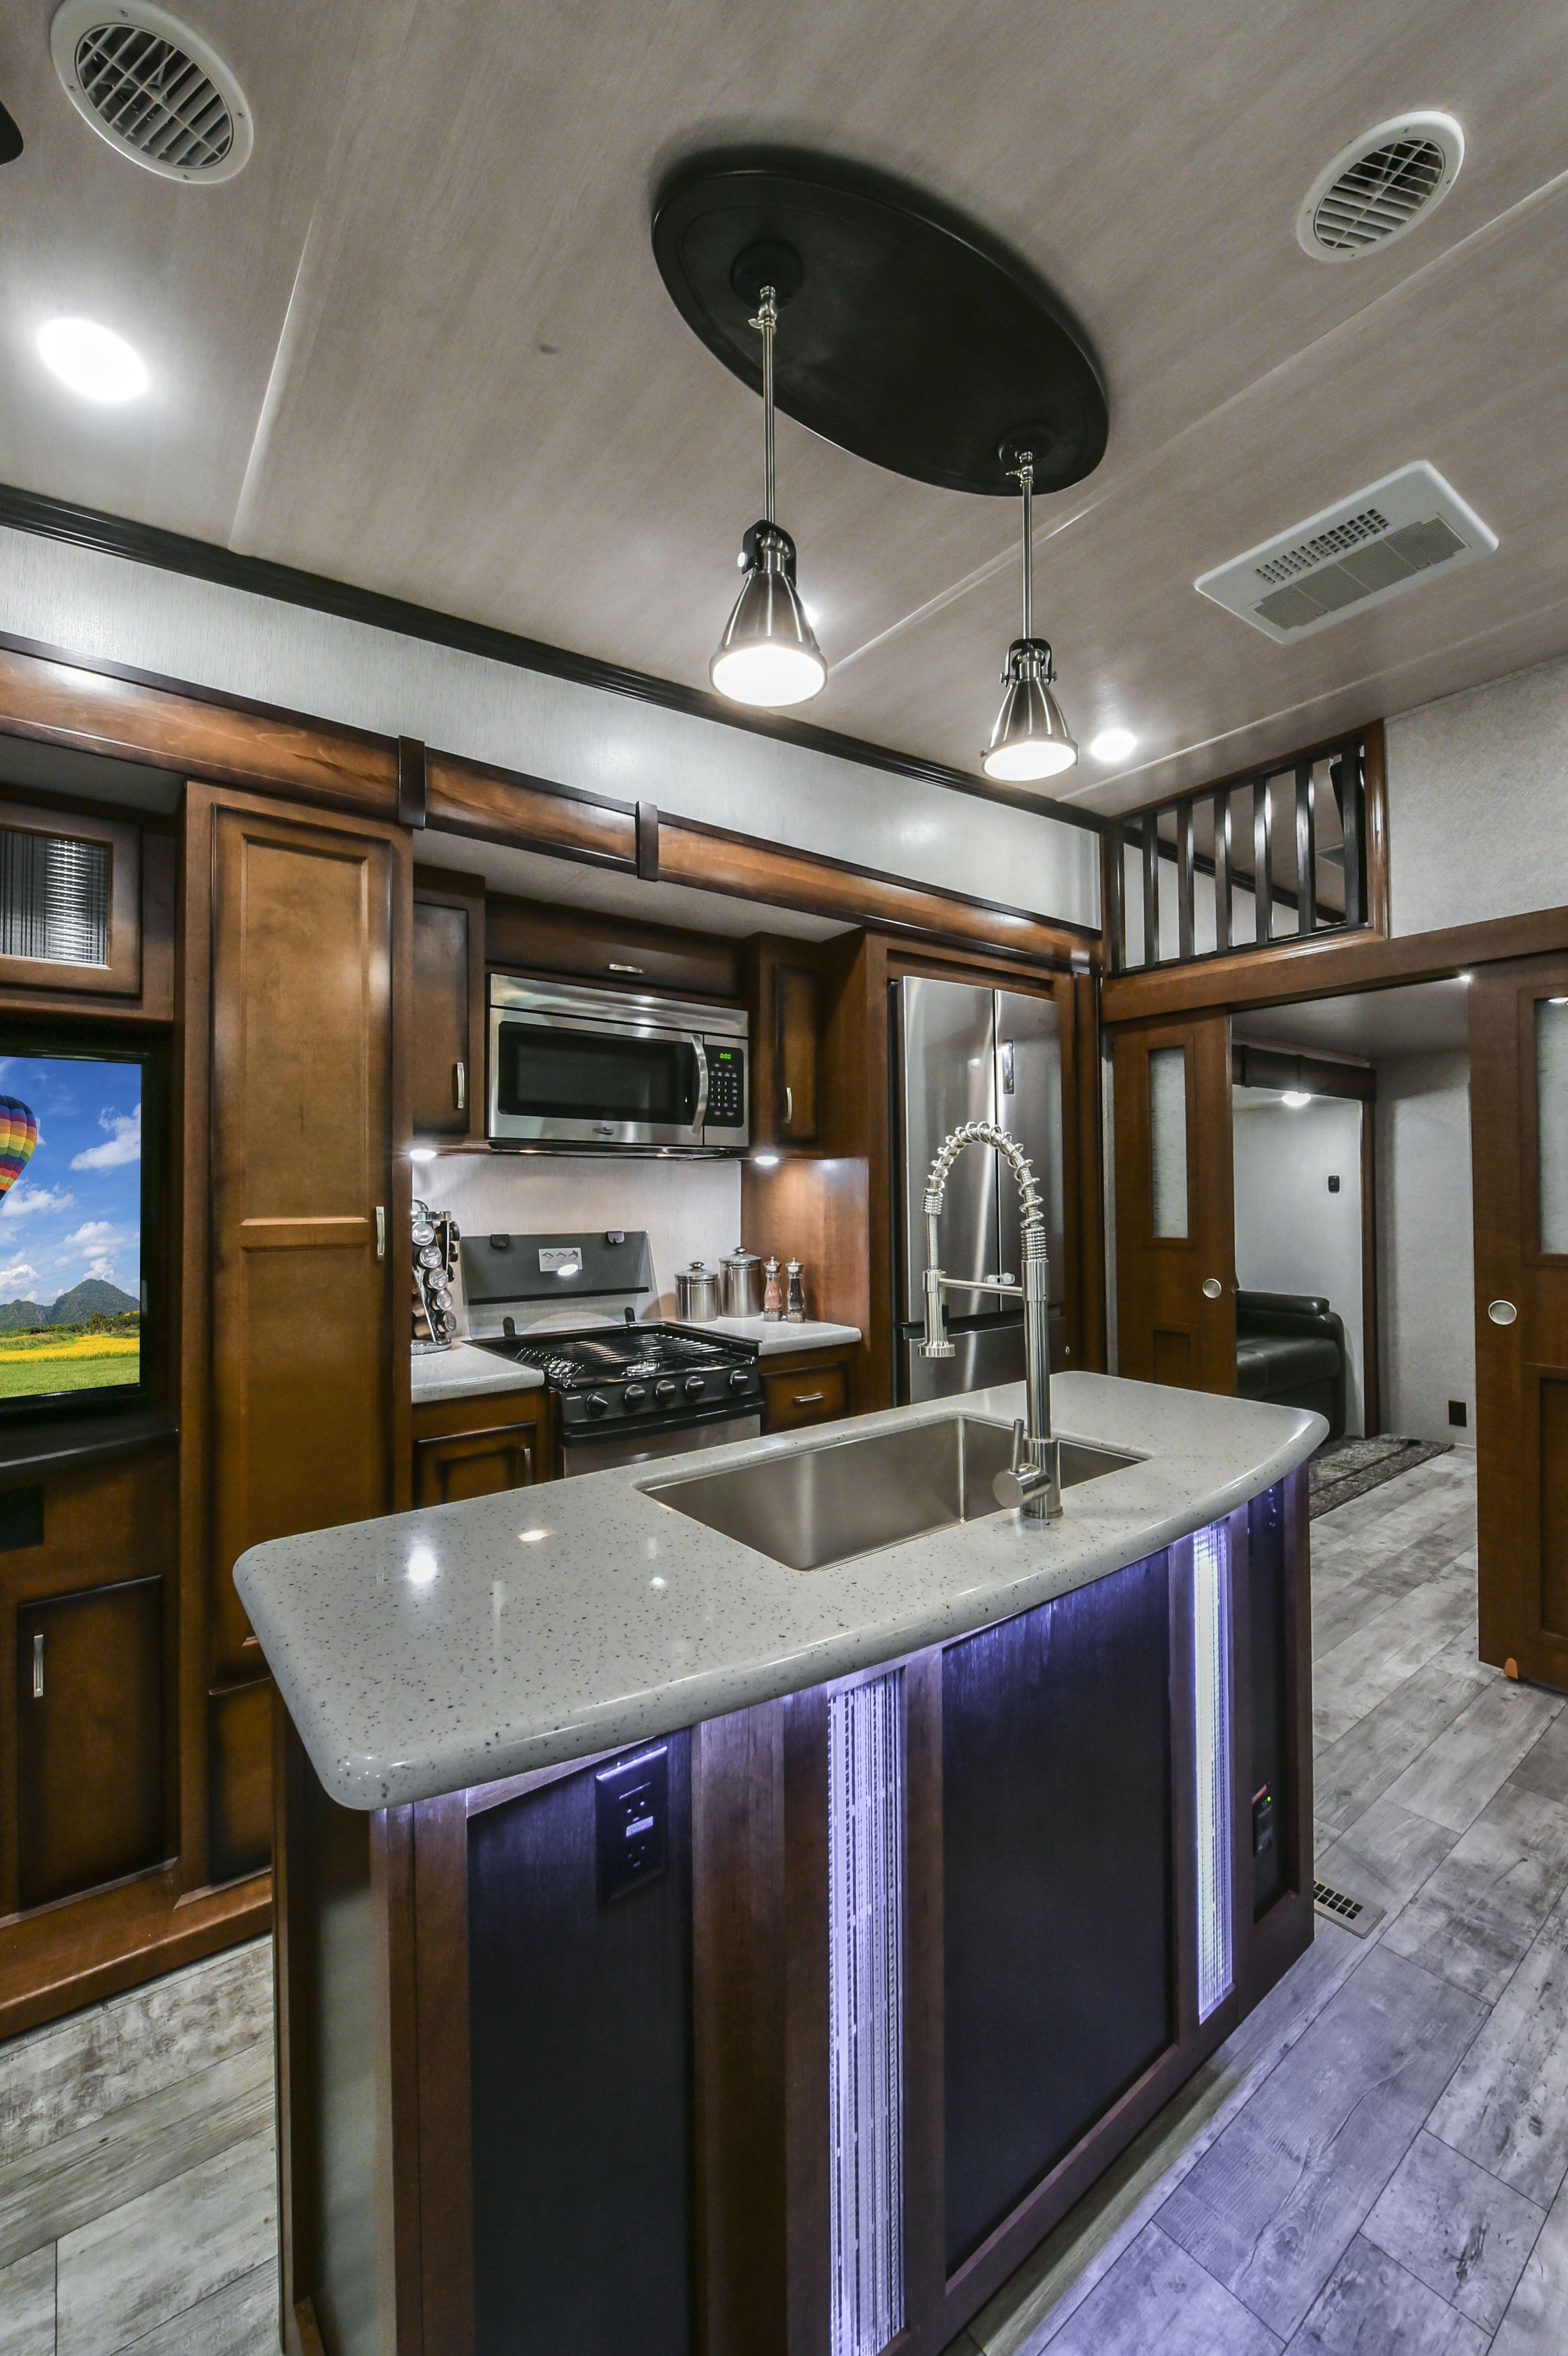 2018 Elkridge 39MBHS 5th Wheel RV Kitchen #heartlandrvs #elkridge #rv  #fifthwheel #